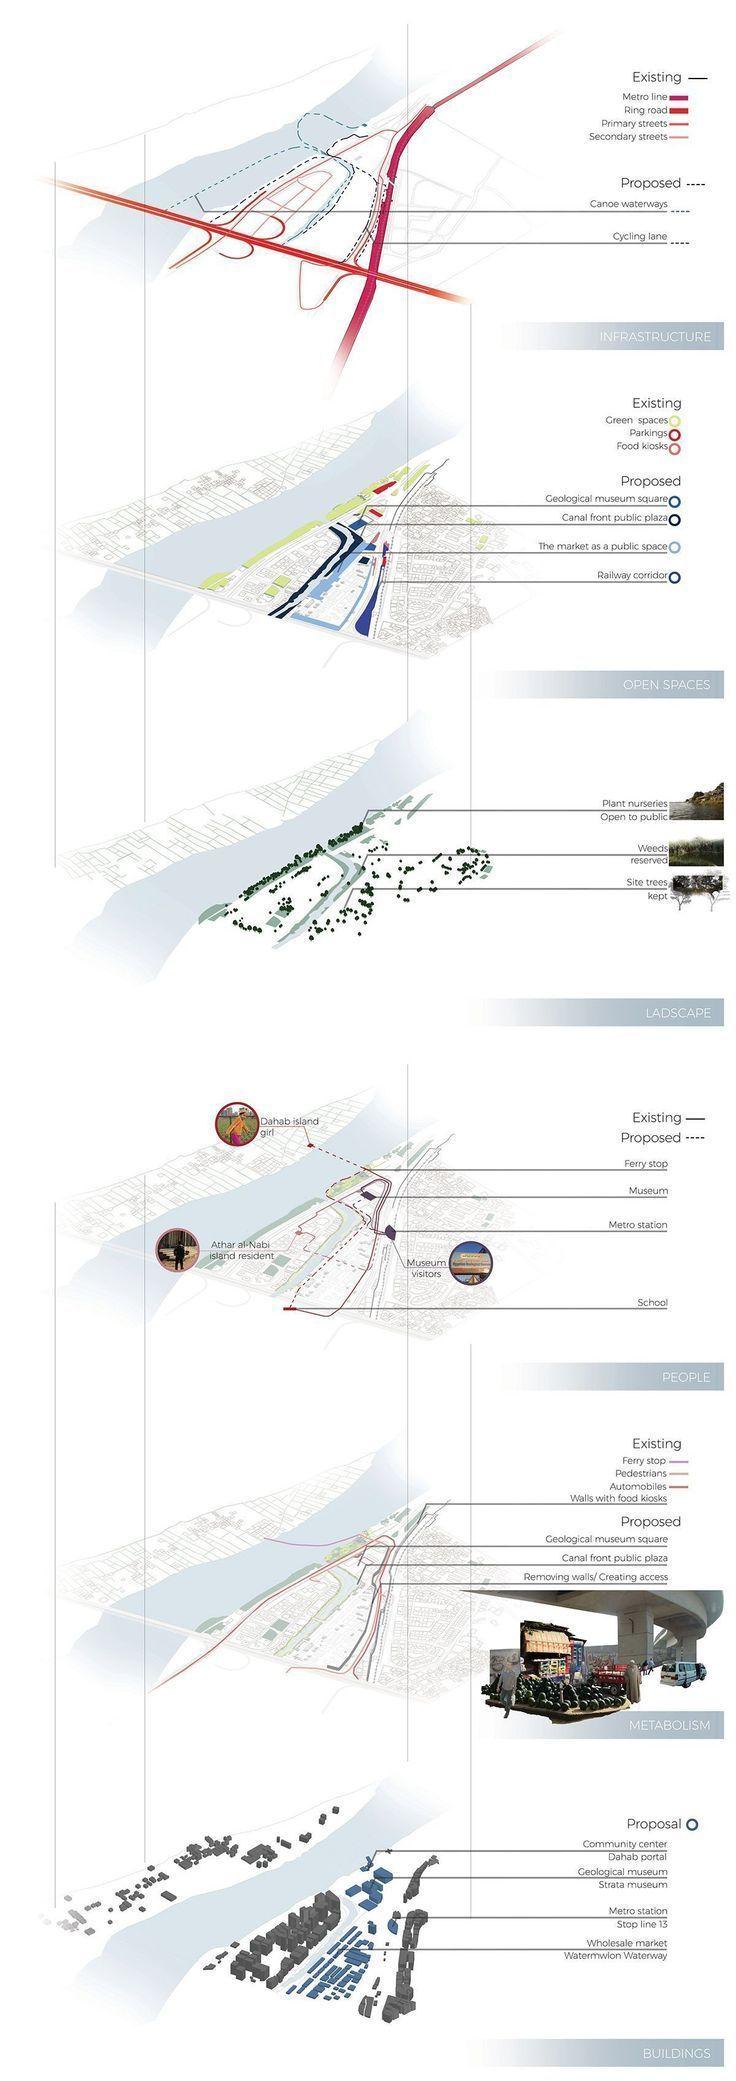 Landscape Zoning Plan & Landscape Zoning Plan